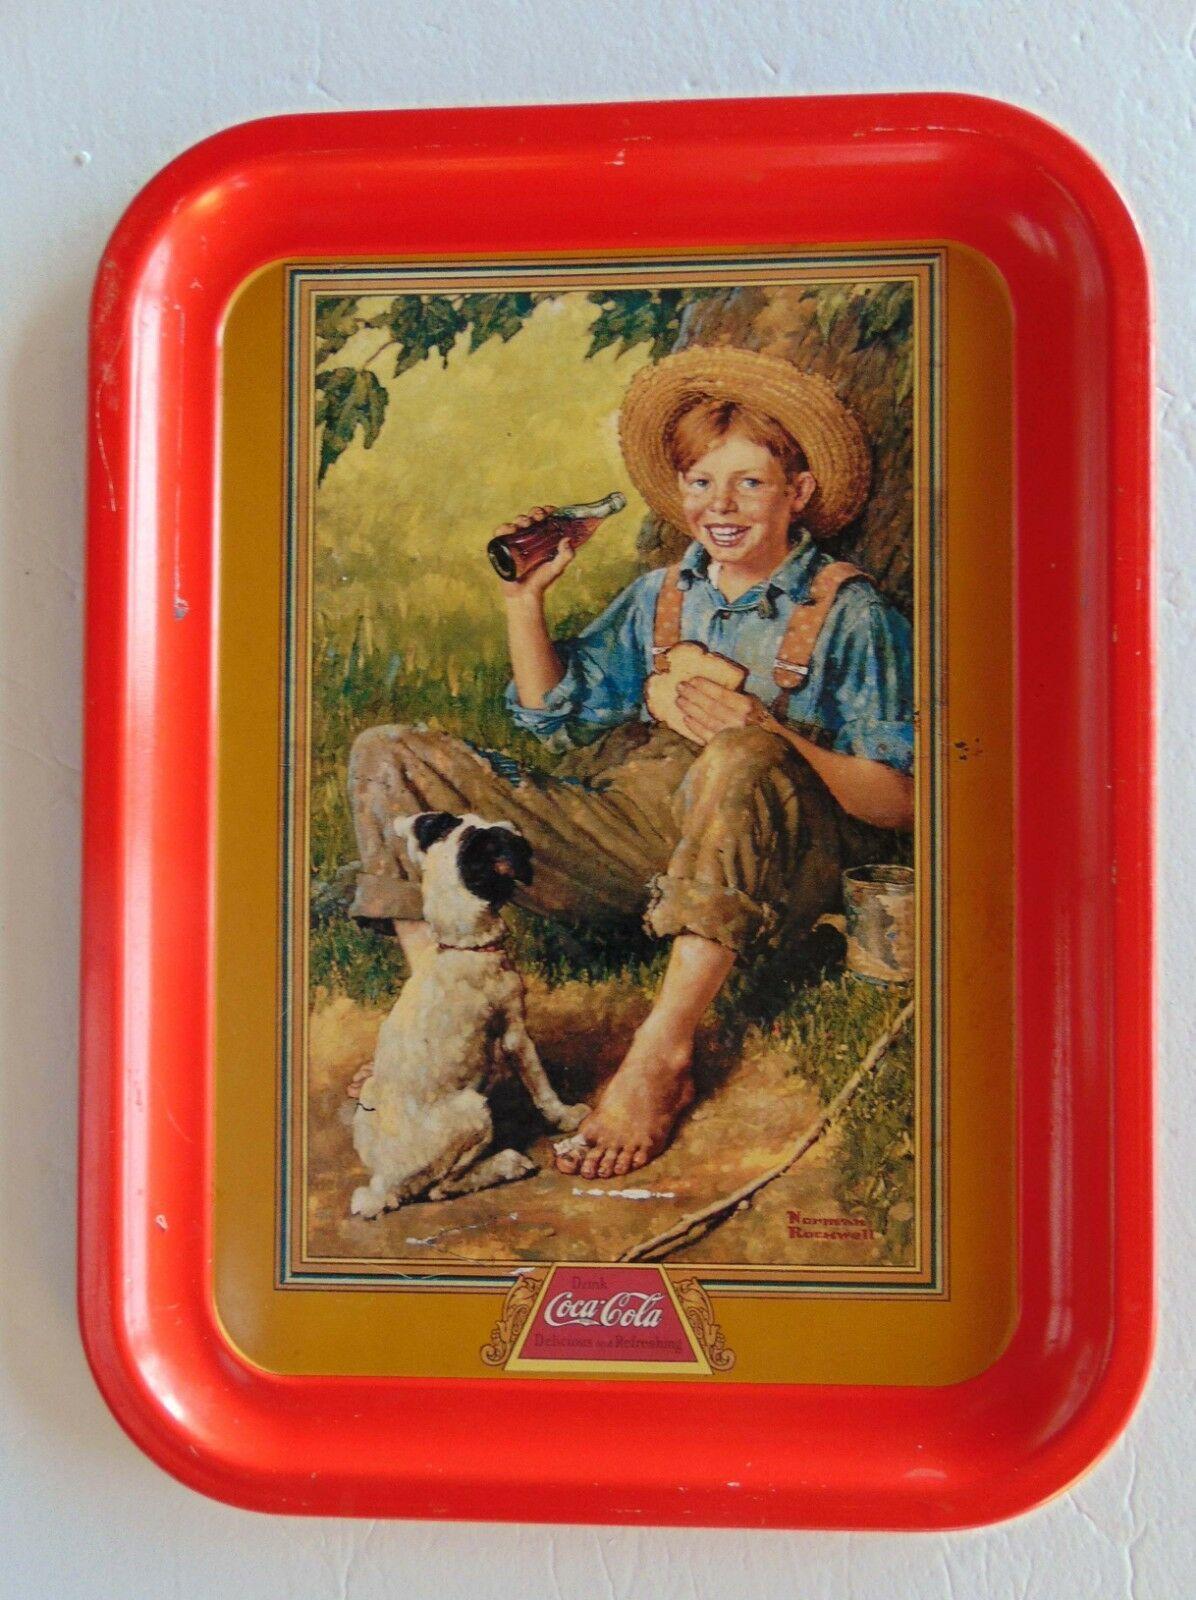 1991 Coca-Cola Barefoot Boy Tray - Norman Rockwell Scene